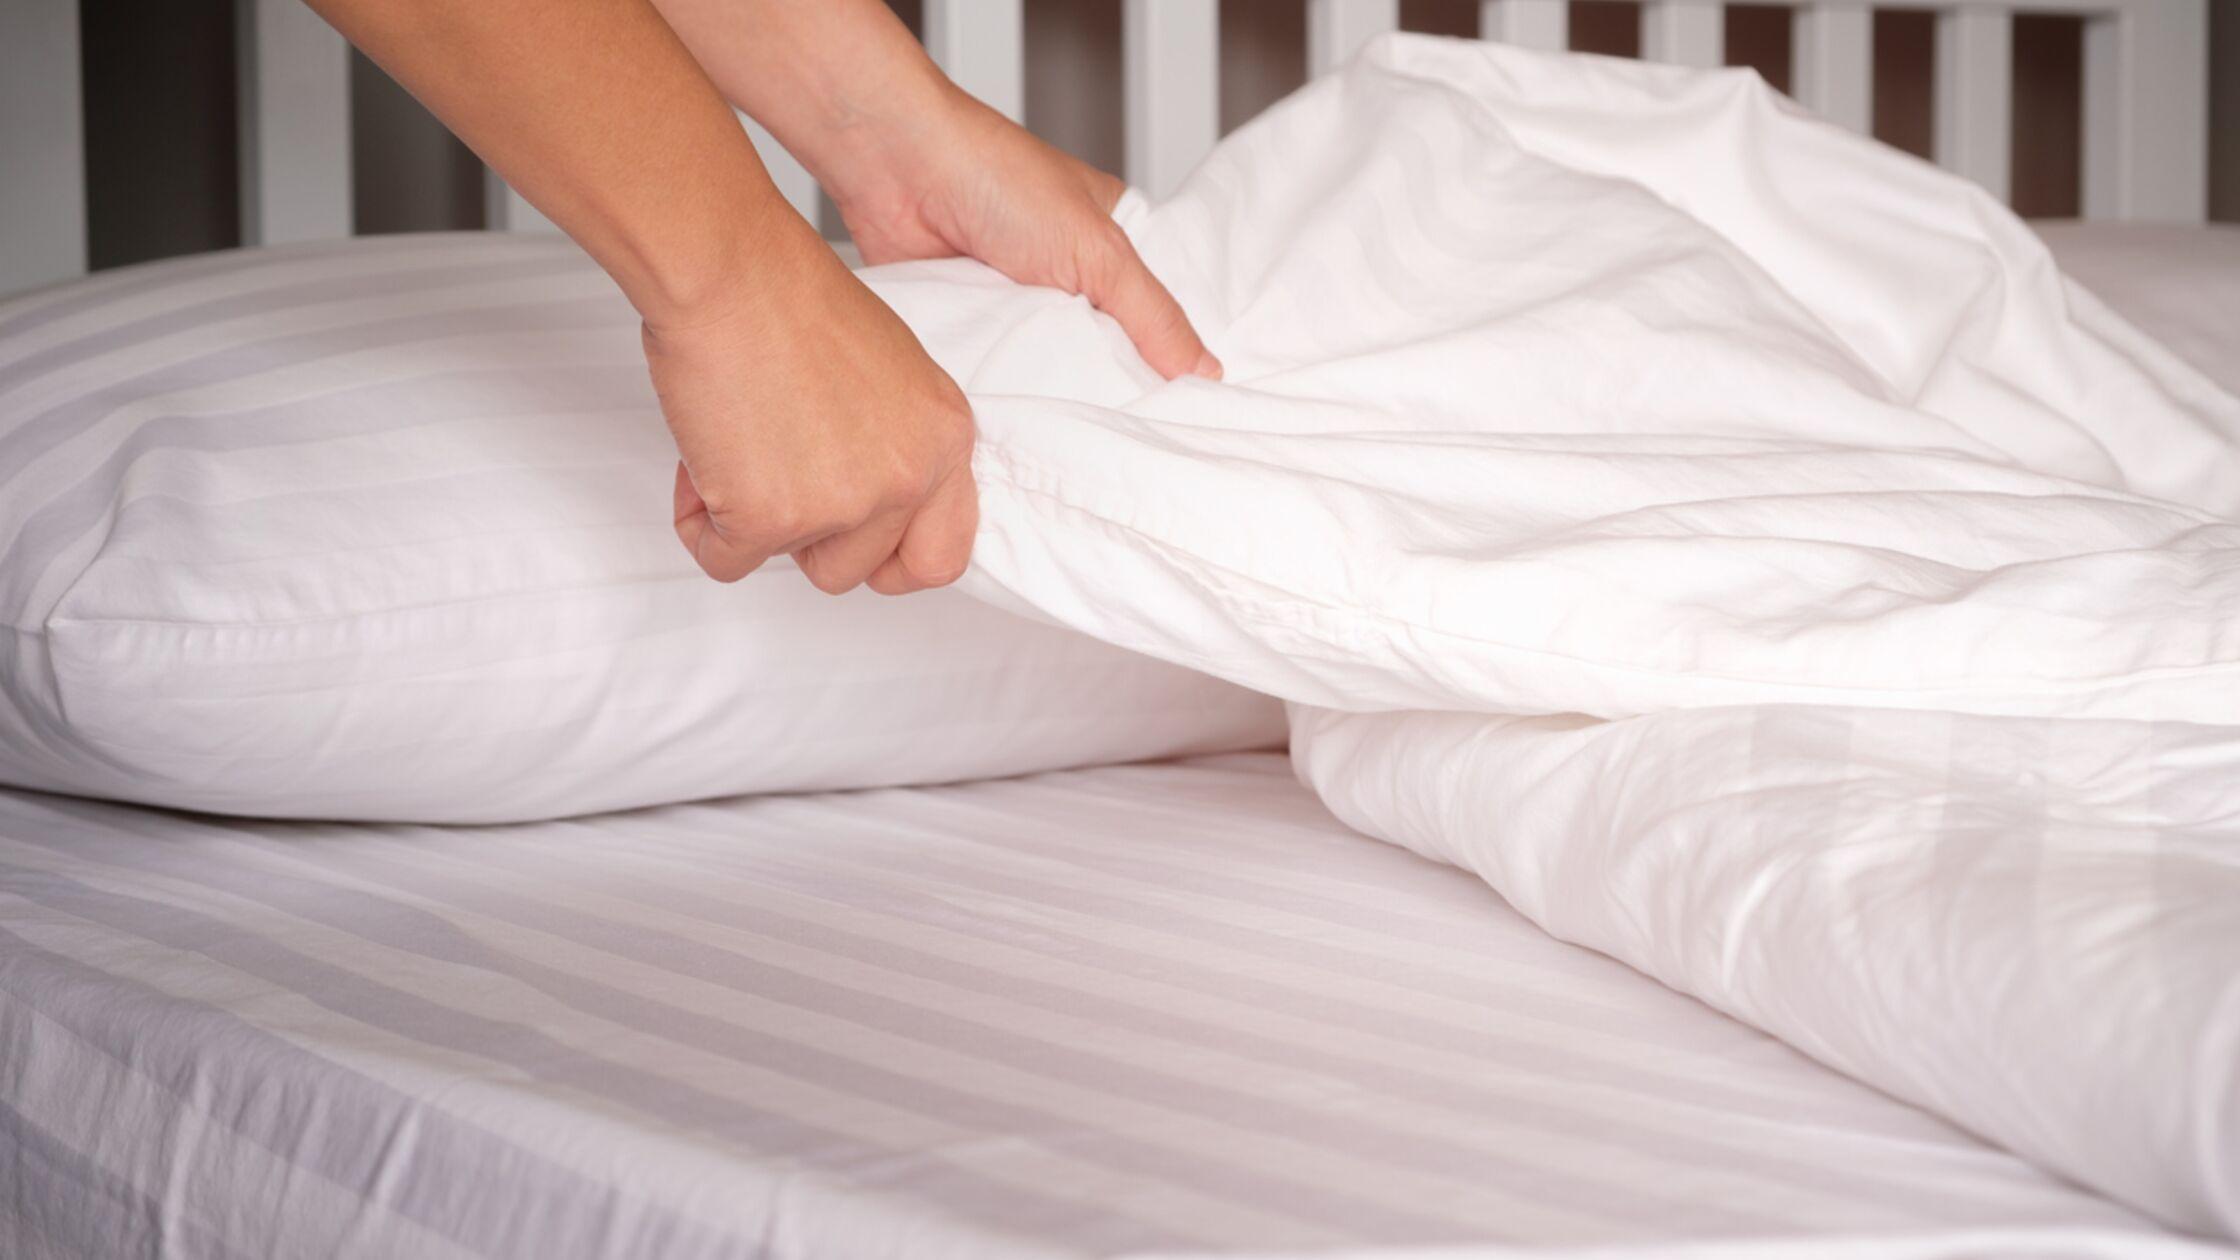 Mann wechselt Bettwäsche